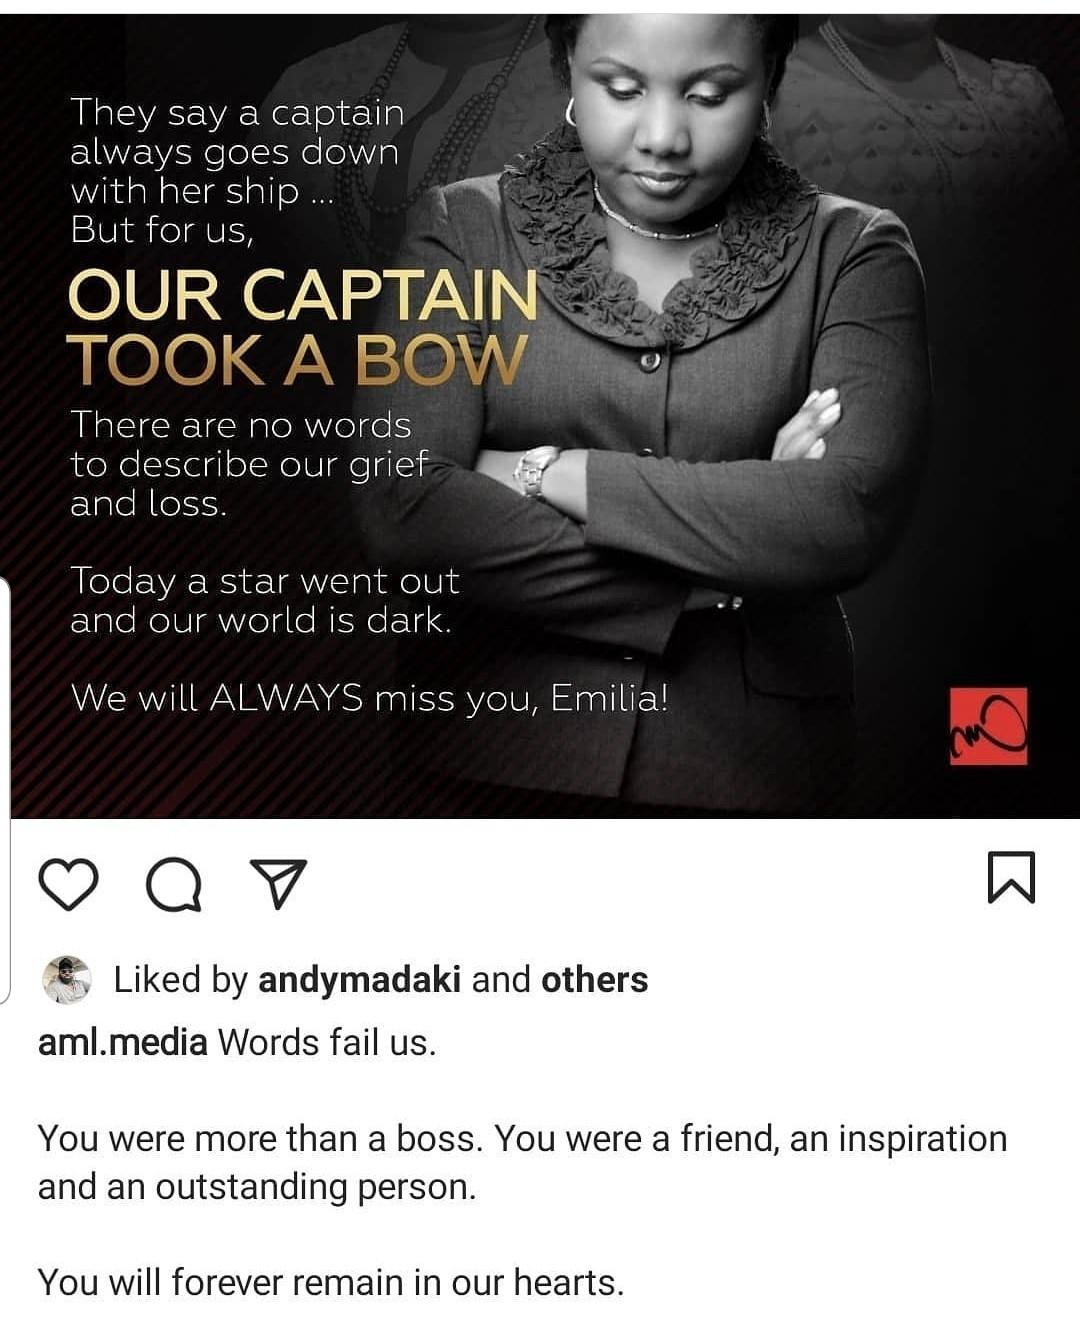 Former Future Awards Co-founder, Emilia Asim is dead